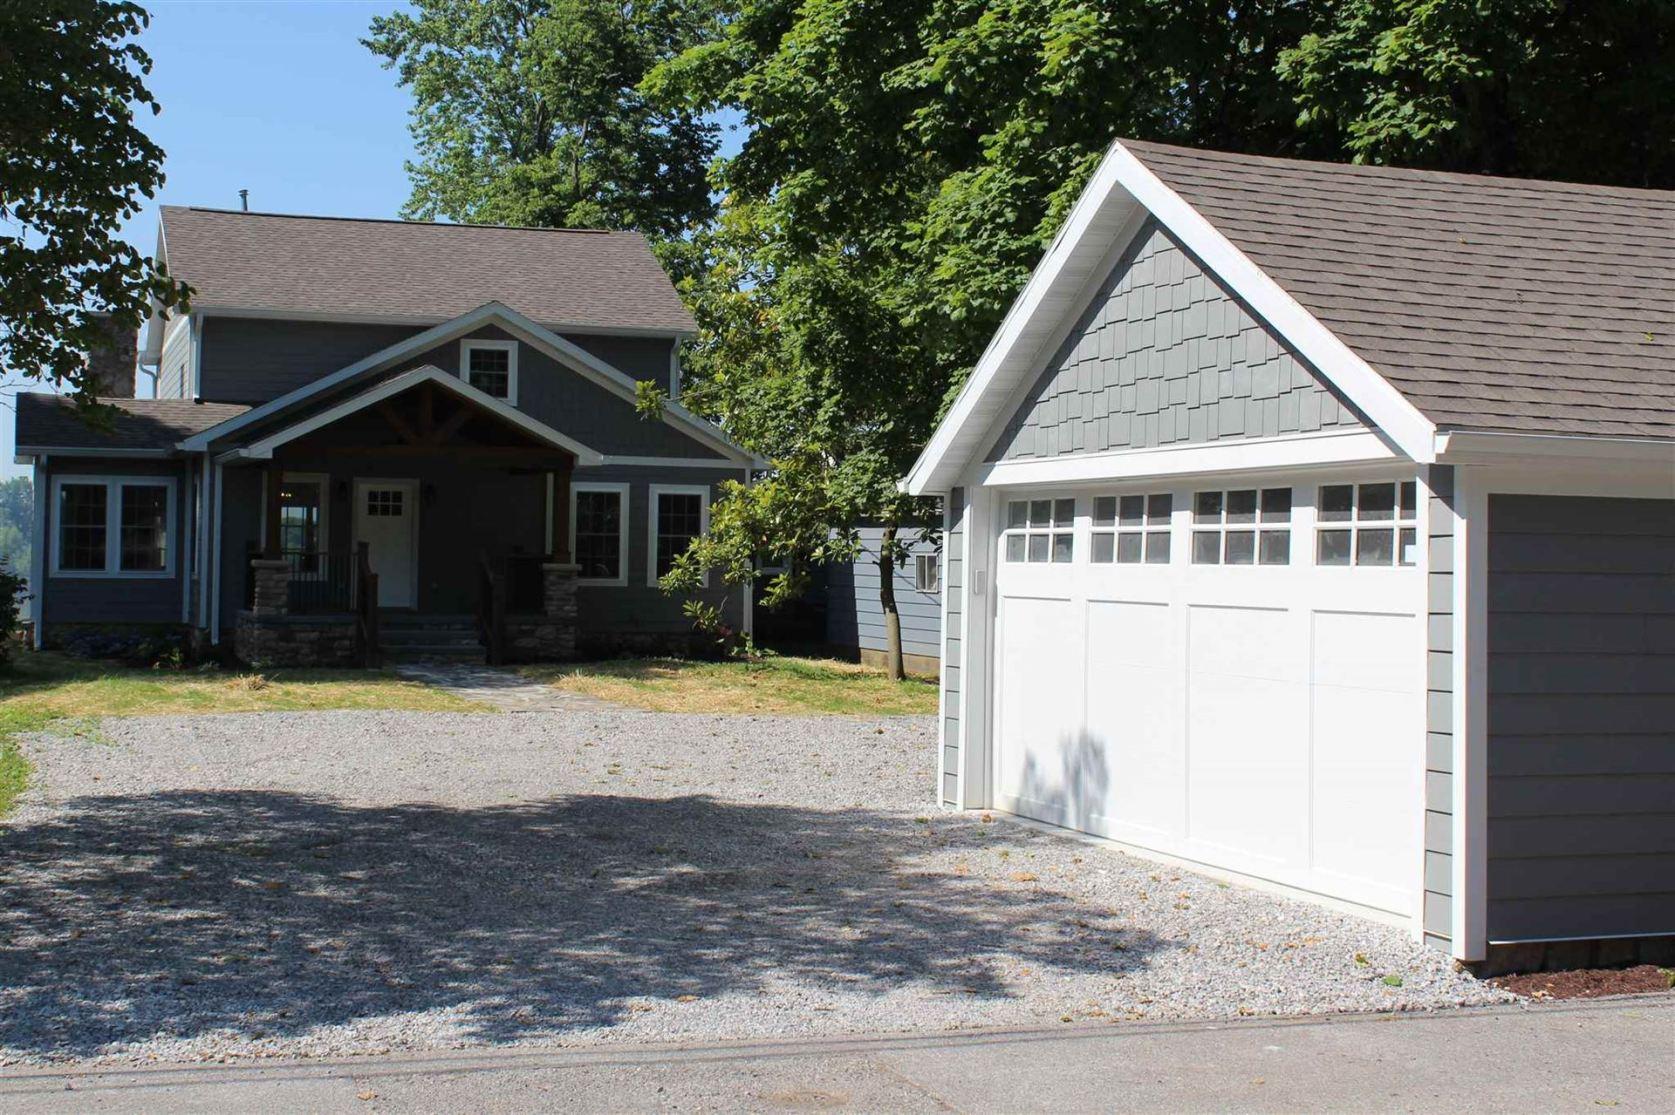 Photo of 1001 W Phelps Drive, Newburgh, IN 47630 (MLS # 202026856)